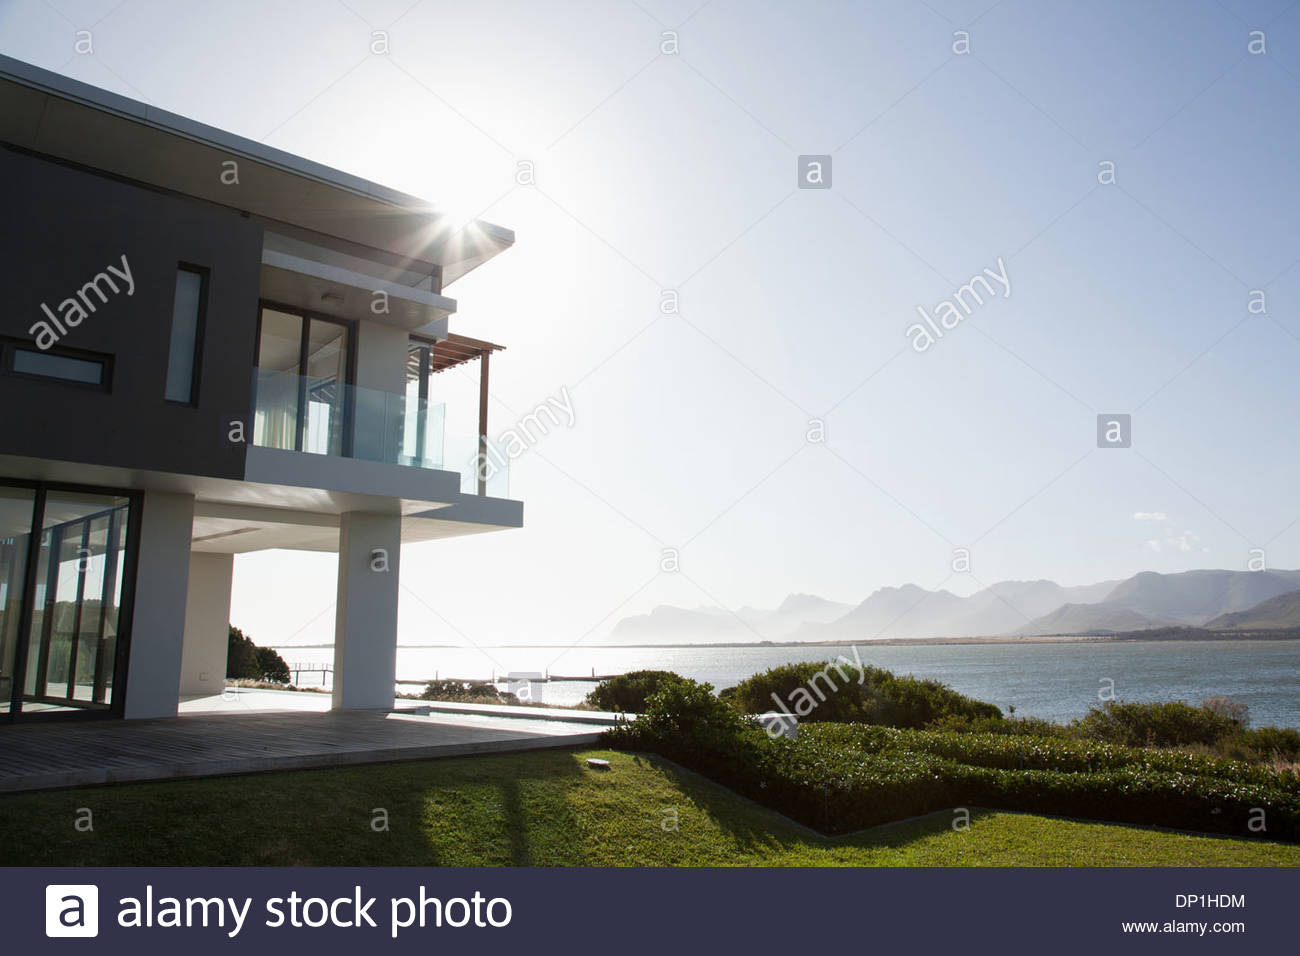 Sun shining over lake and modern house - Stock Image